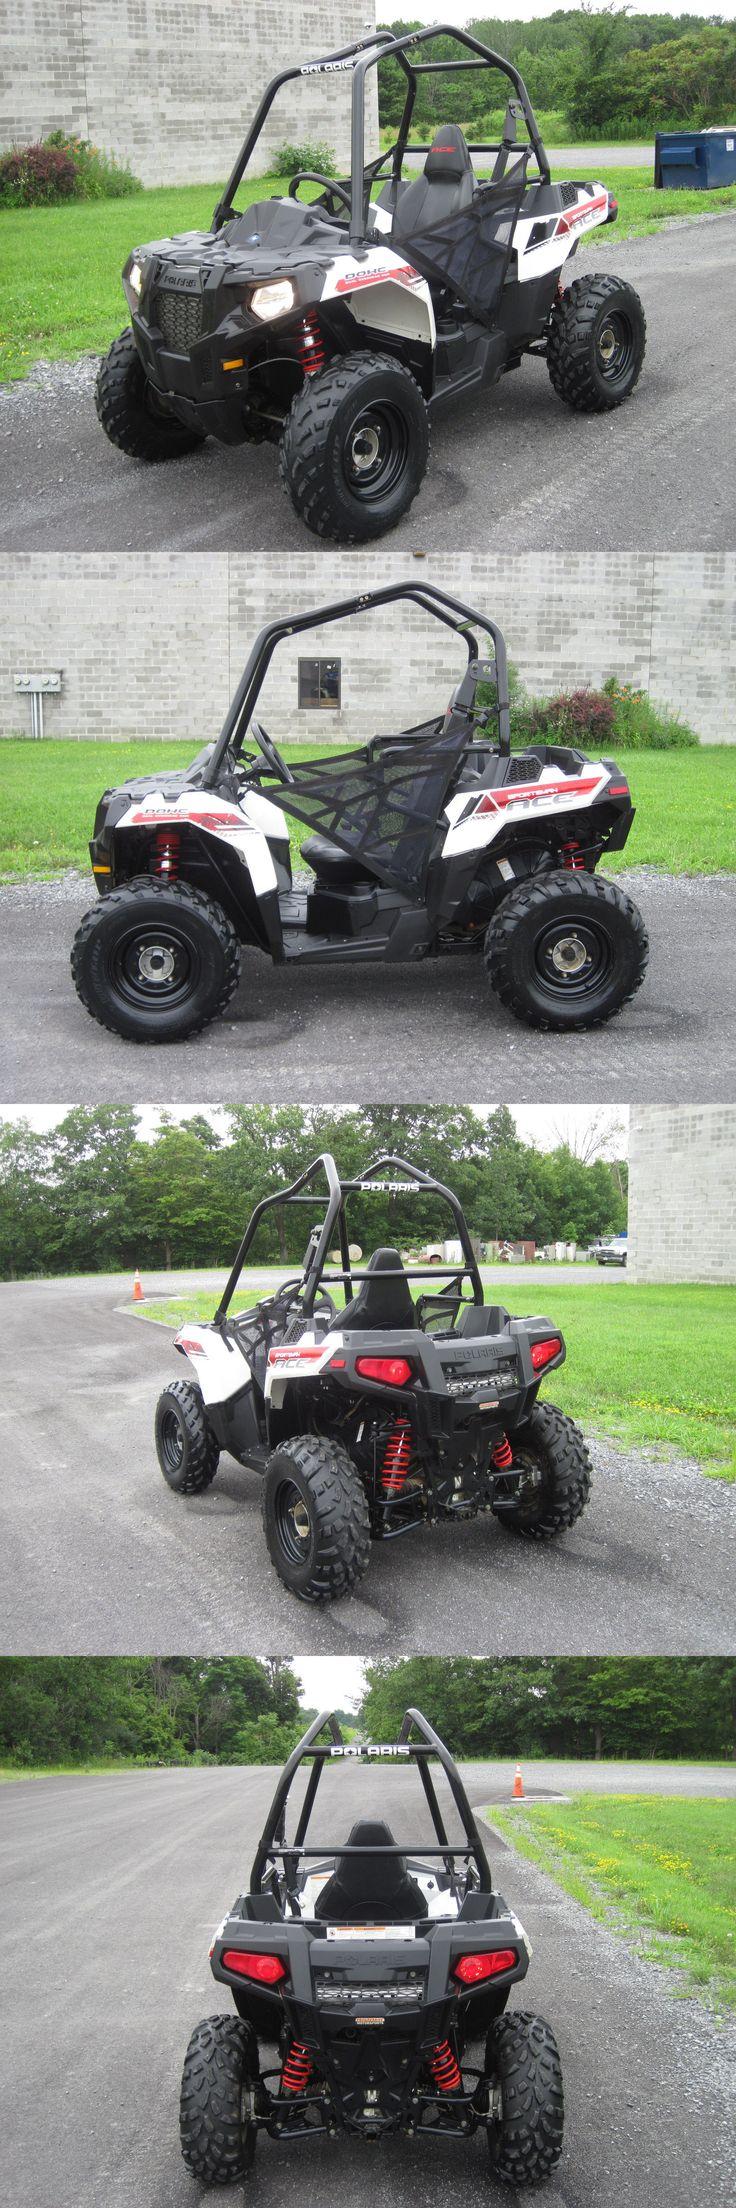 Power Sports ATVs UTVs: 2014 Polaris Sportsman Ace Pro-Star Utv 4X4 Cheap Ship Low Mi Atv Xp 570 Razor R -> BUY IT NOW ONLY: $2060 on eBay!